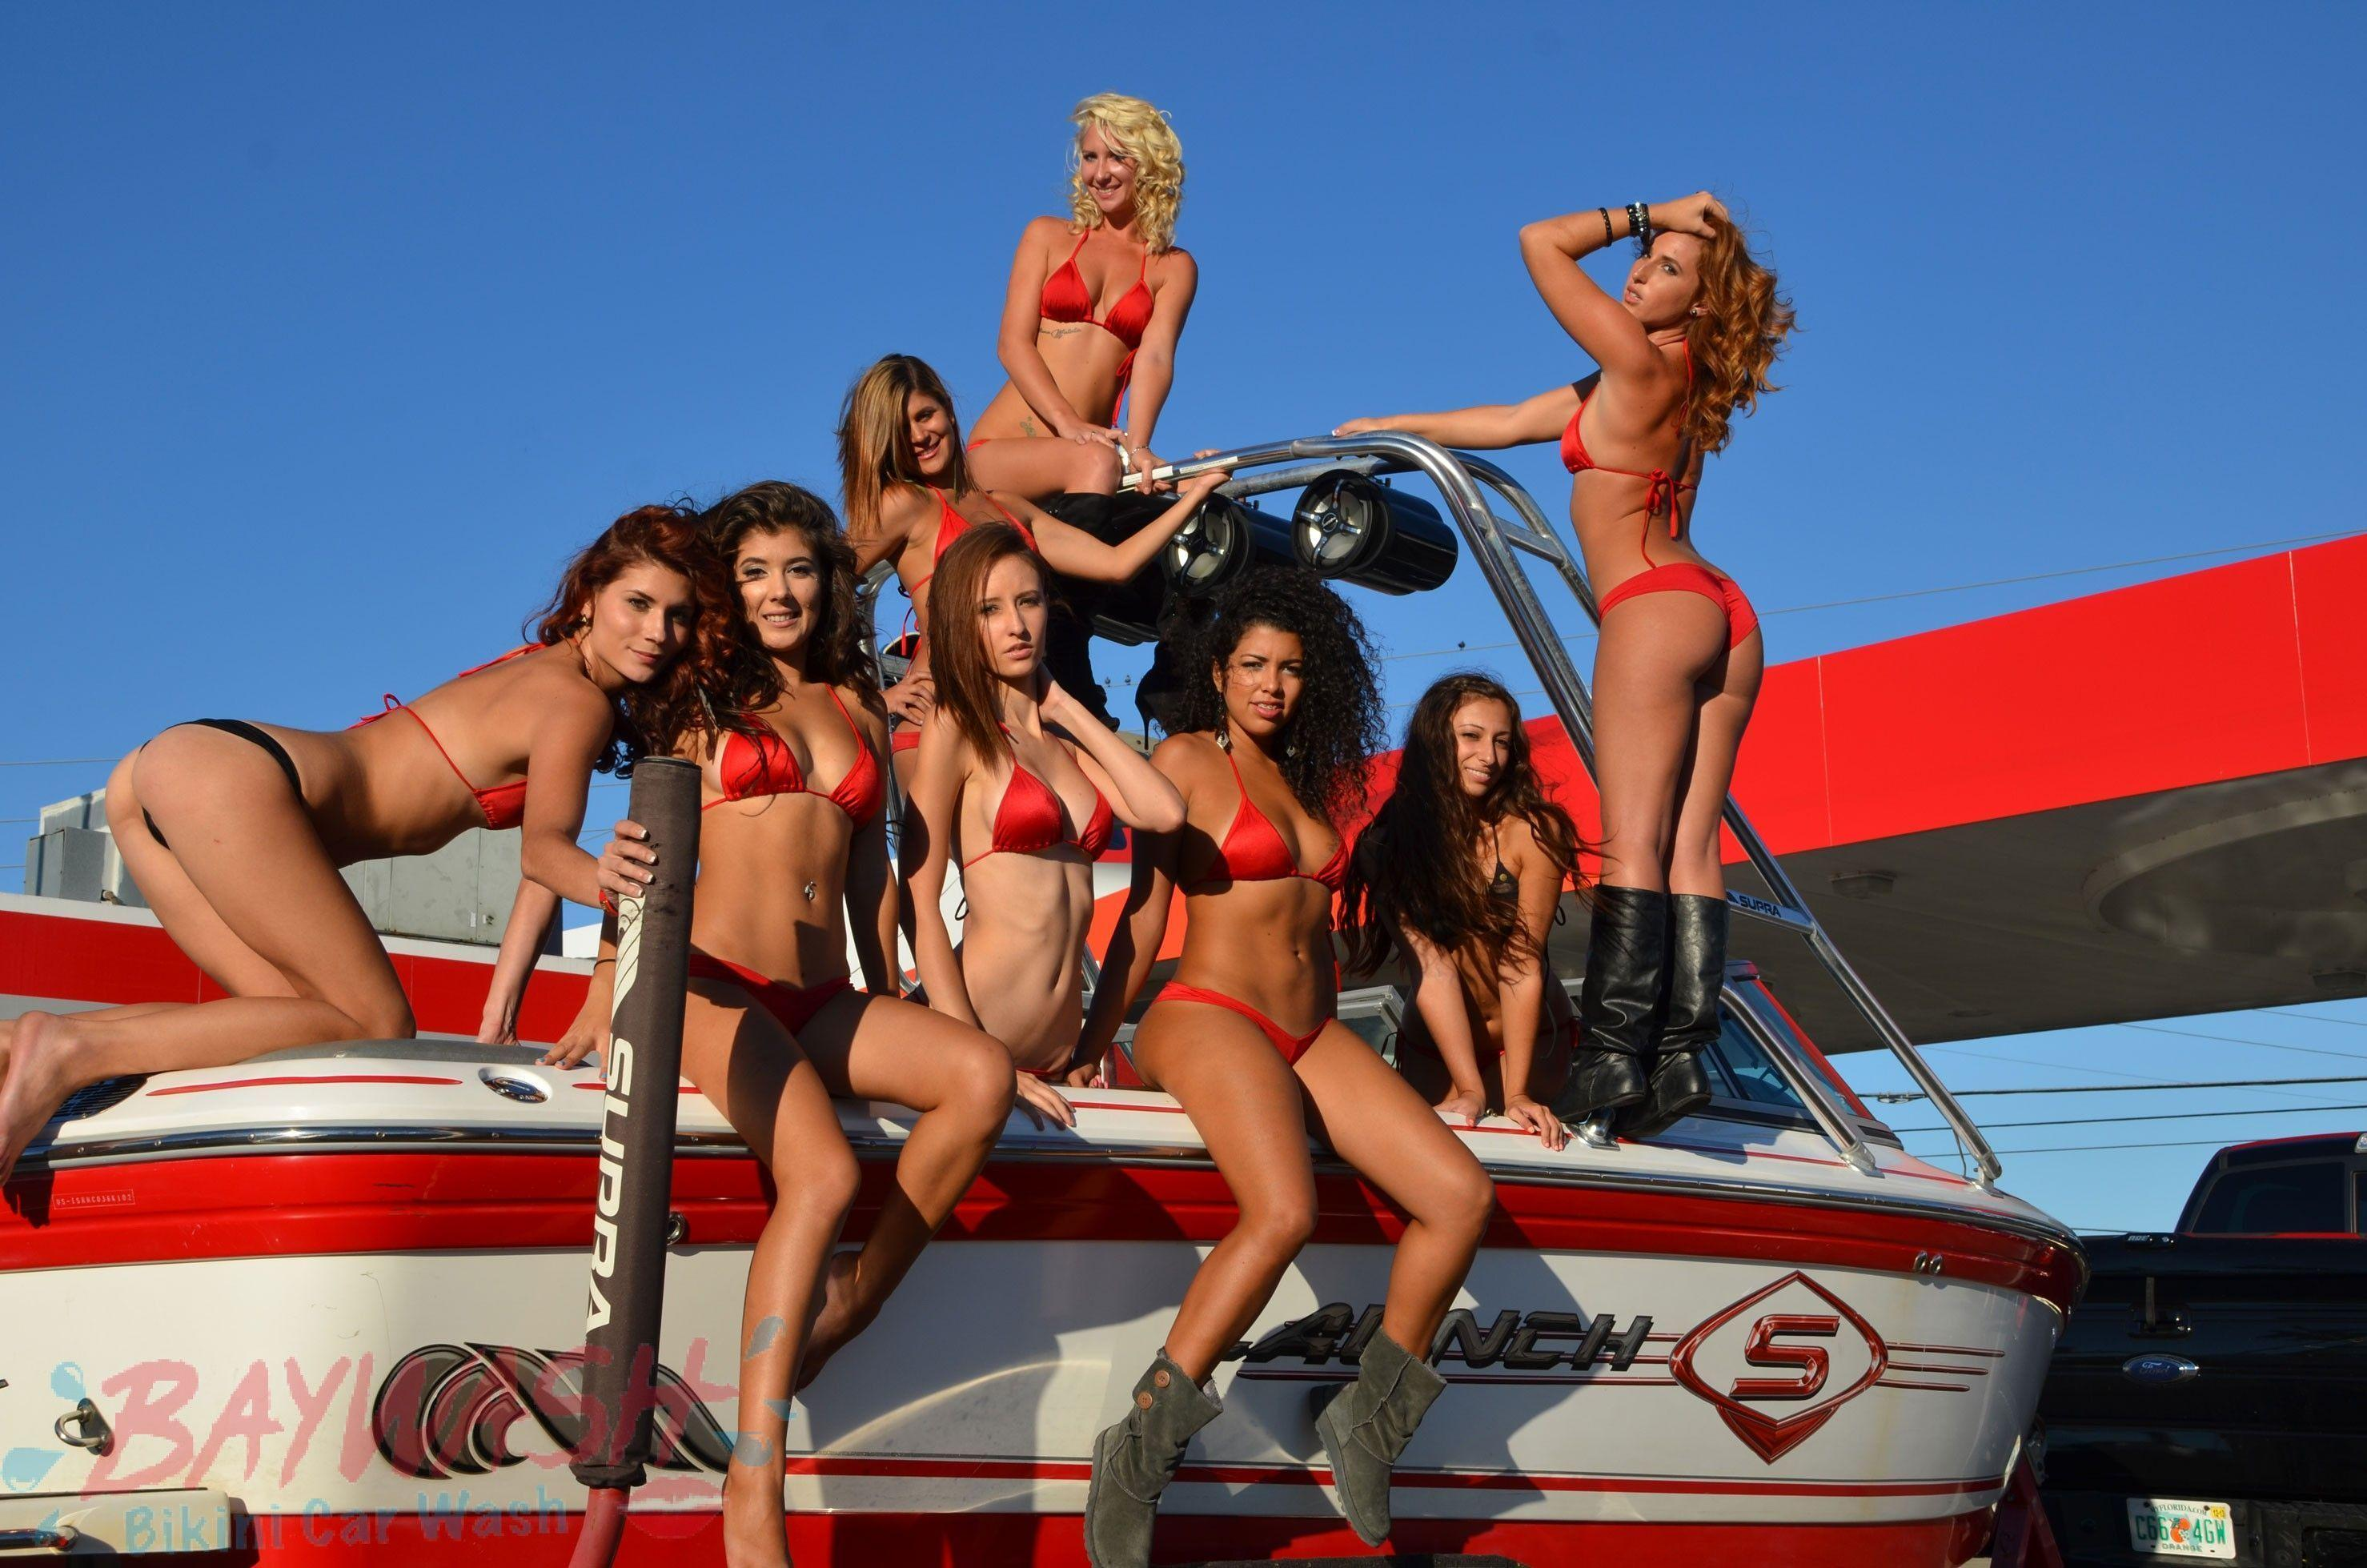 Ice reccomend Bikini boat wash